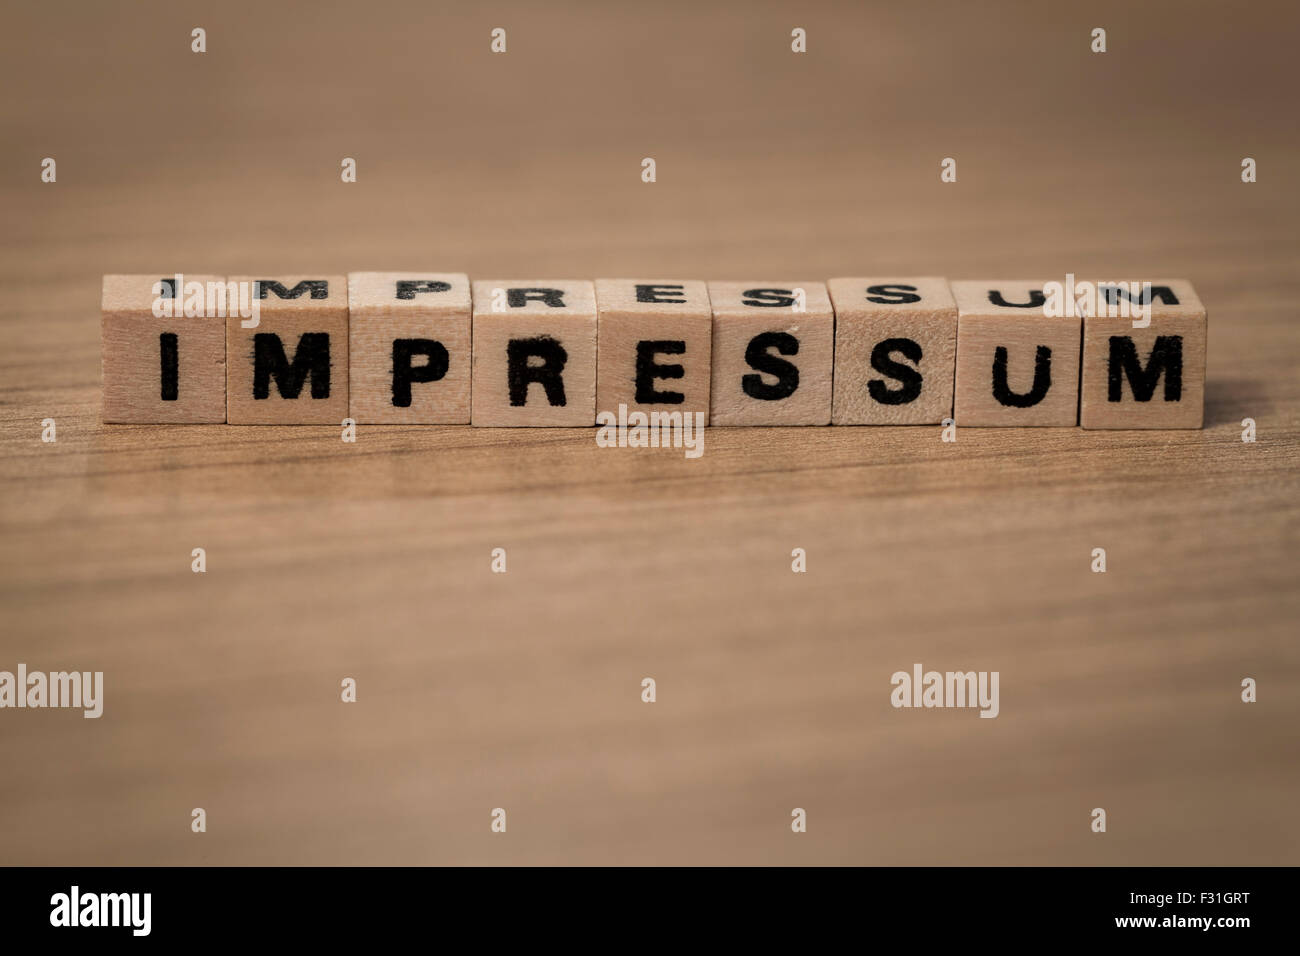 impressum (german imprint) written in wooden cubes on a desk - Stock Image